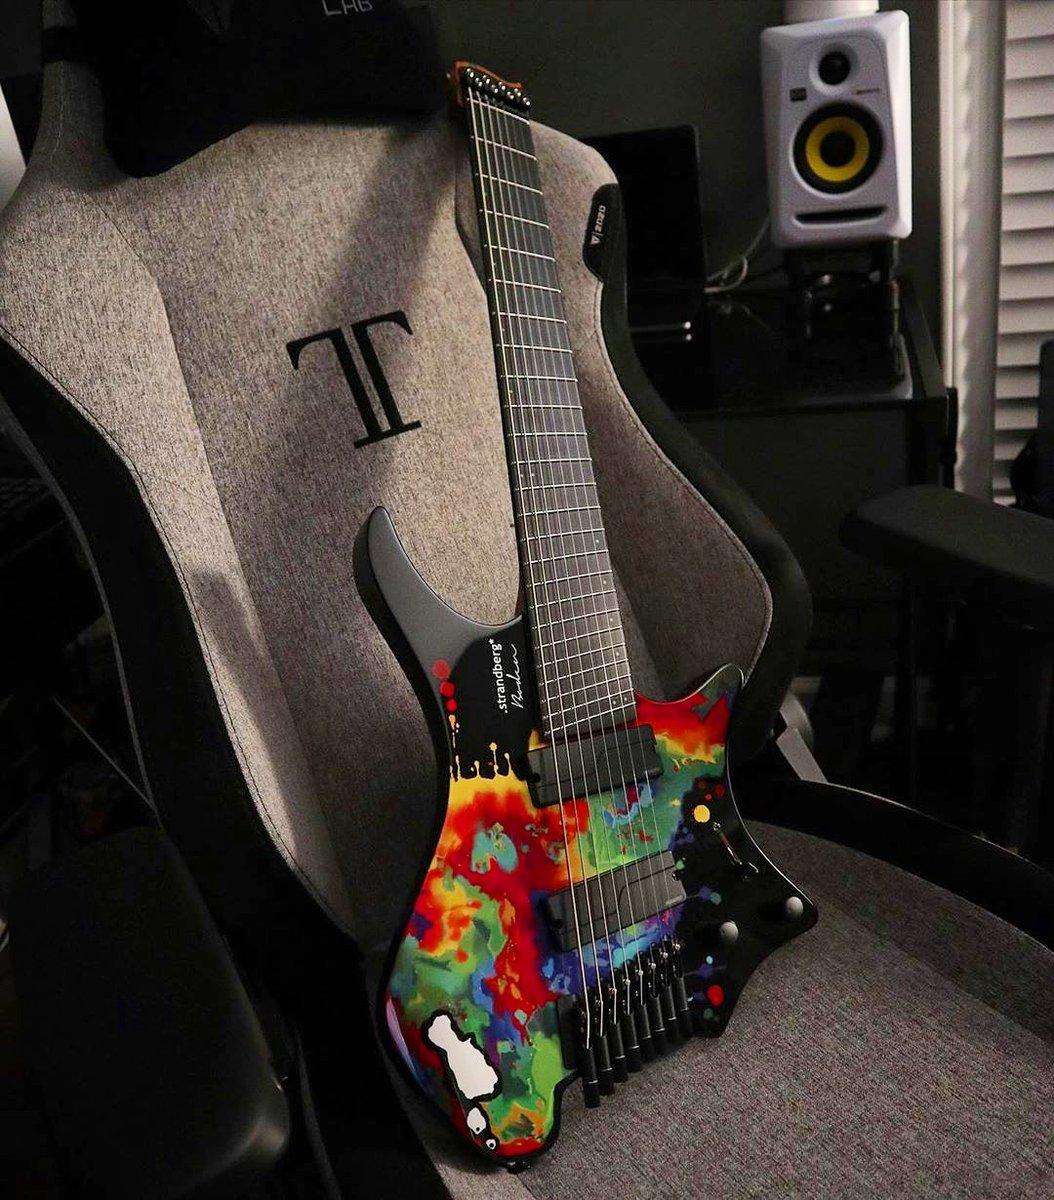 Happy new 8-String guitar day to IG @judge.shredd, who is thoroughly enjoying his @SarahLongfield Signature Boden! Happy music making Ryan! . . . #strandbergguitars #headlessguitars #boden #sarahlongfield #signaturemodel #8stringguitar #fishmanpickups #newgearday #goheadlesspic.twitter.com/DQYlotr8OK